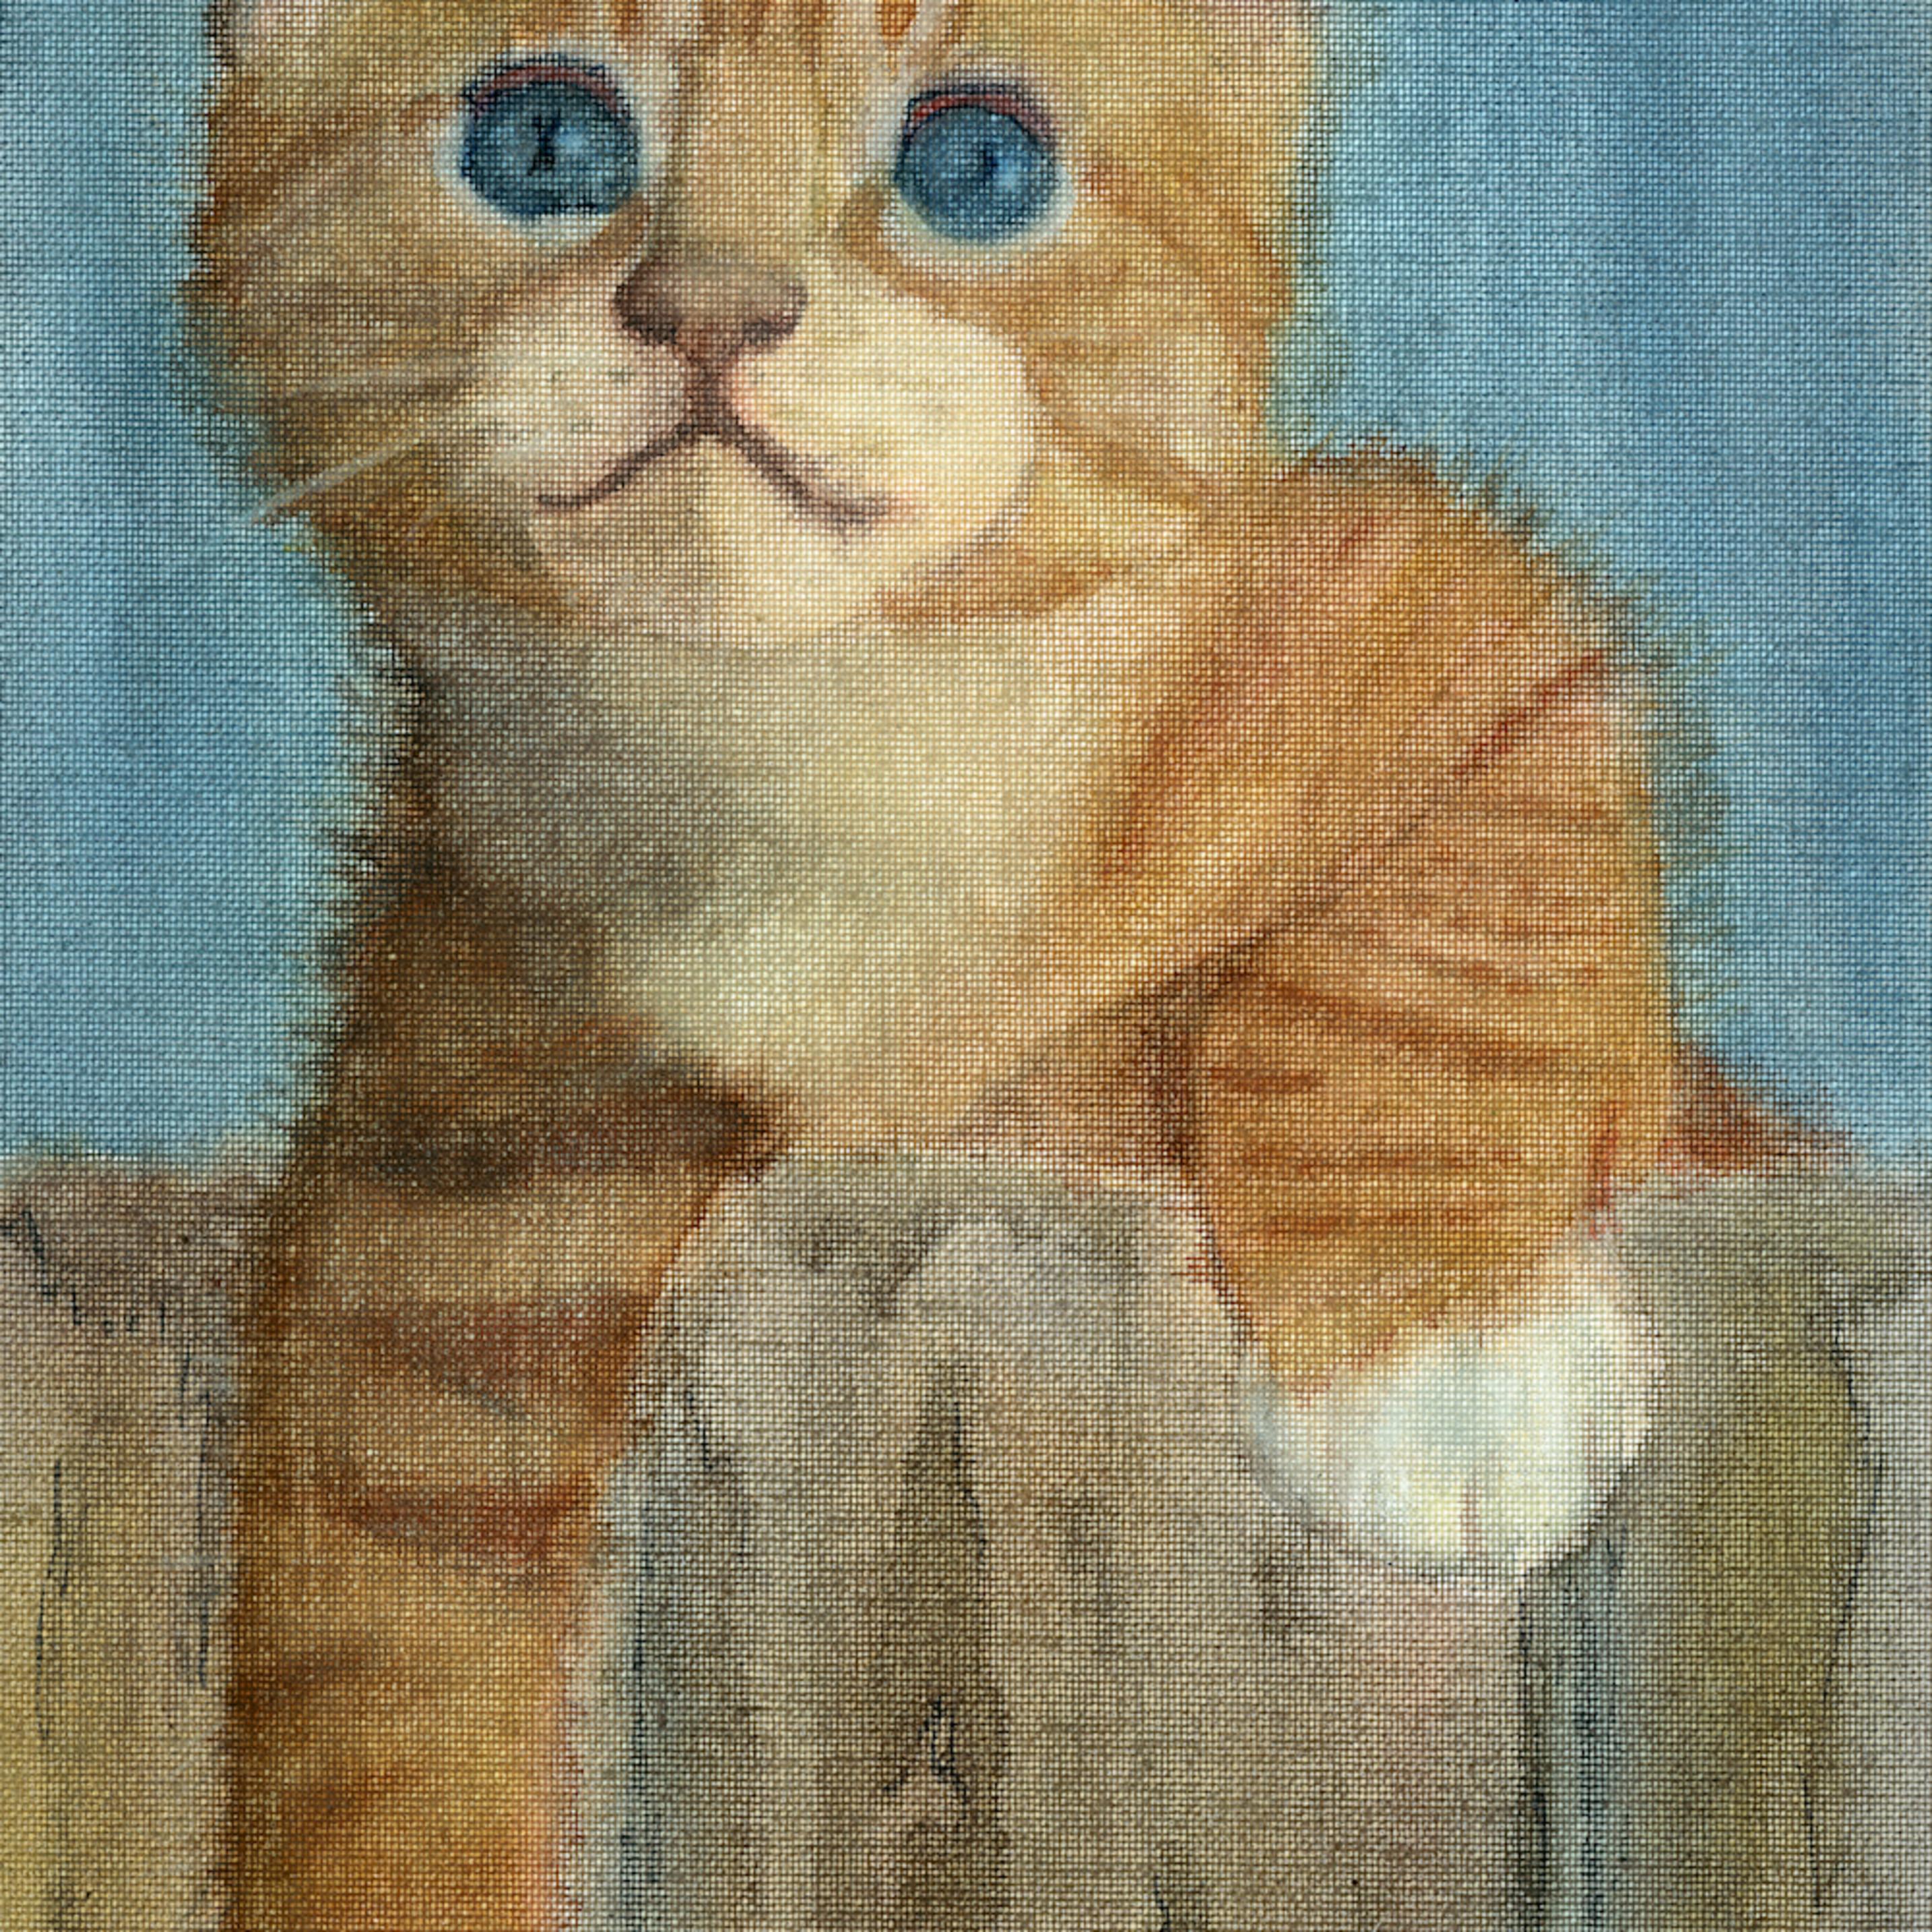 Kitten for michelle sggwzy